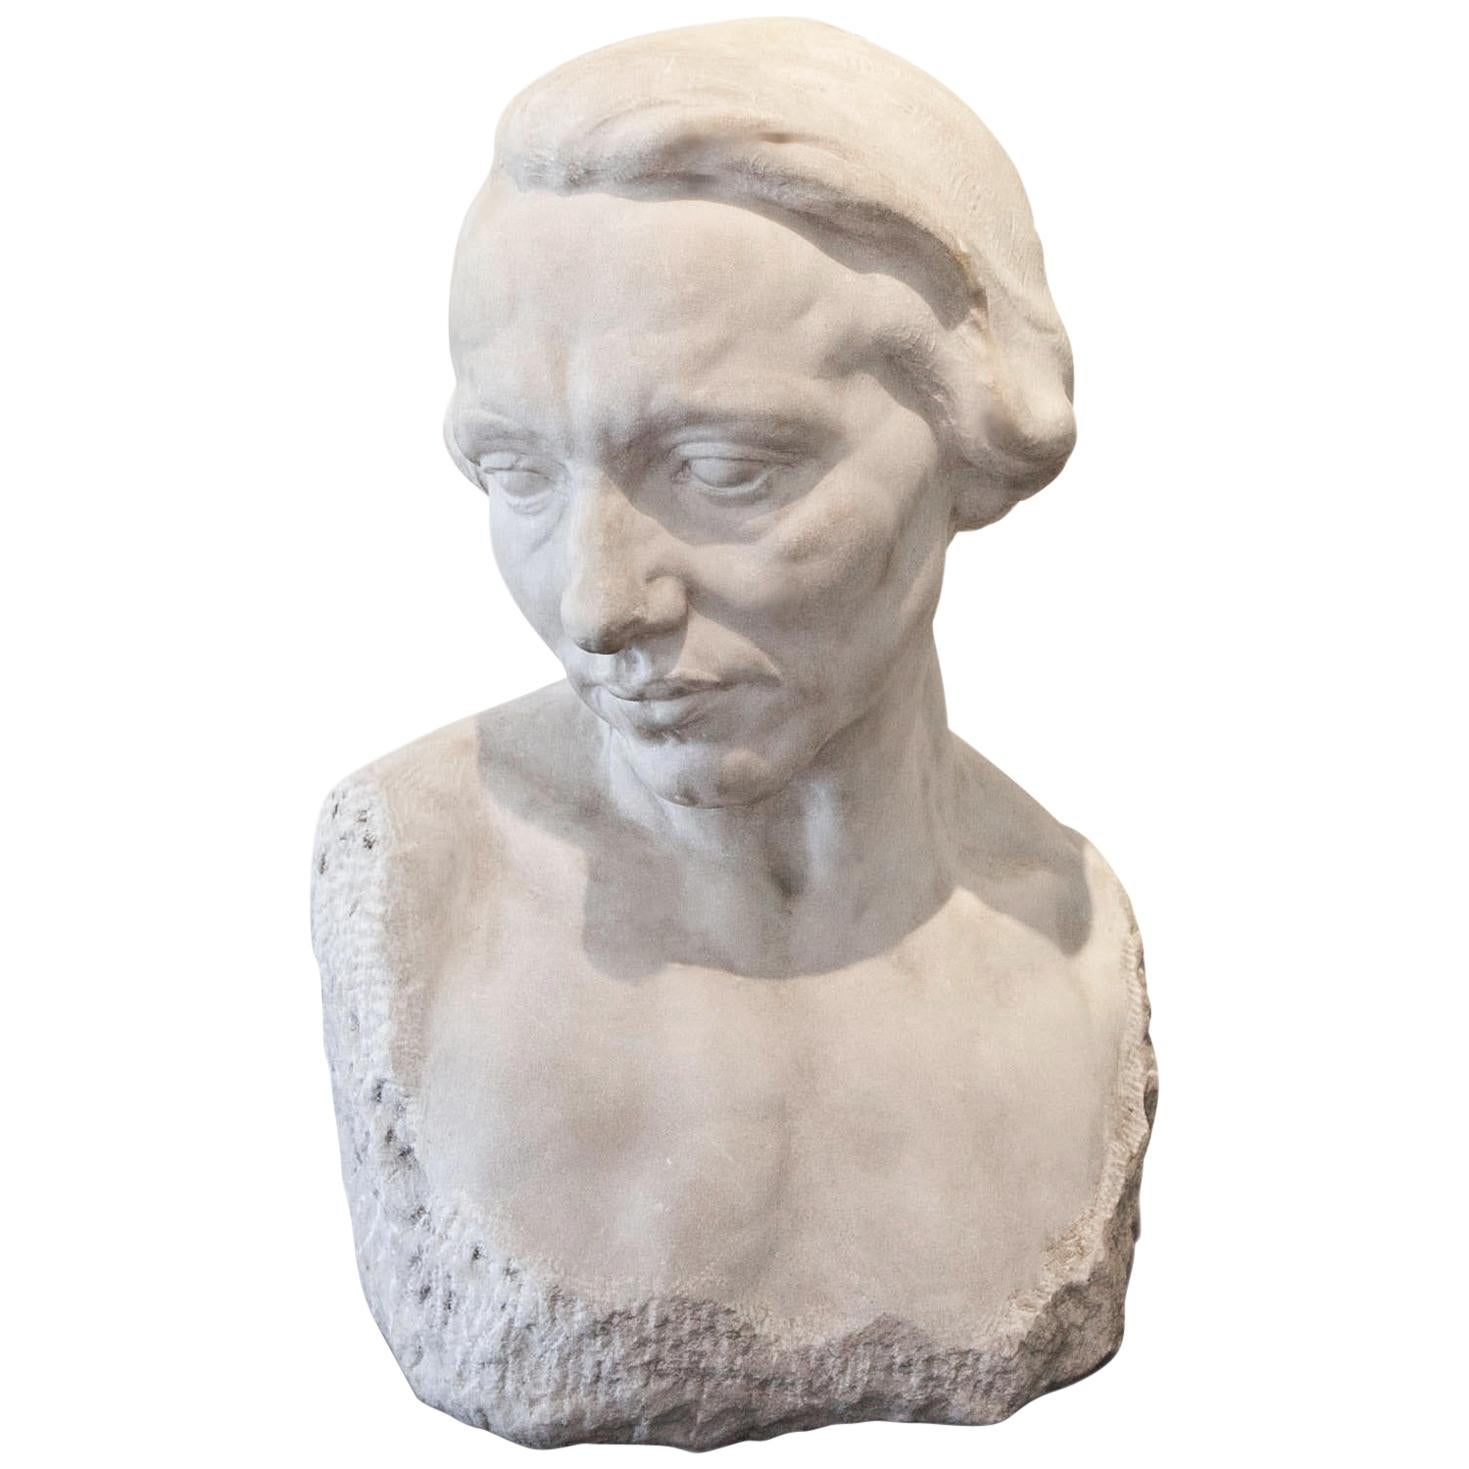 Sculpture of a Female Head, circa 1900